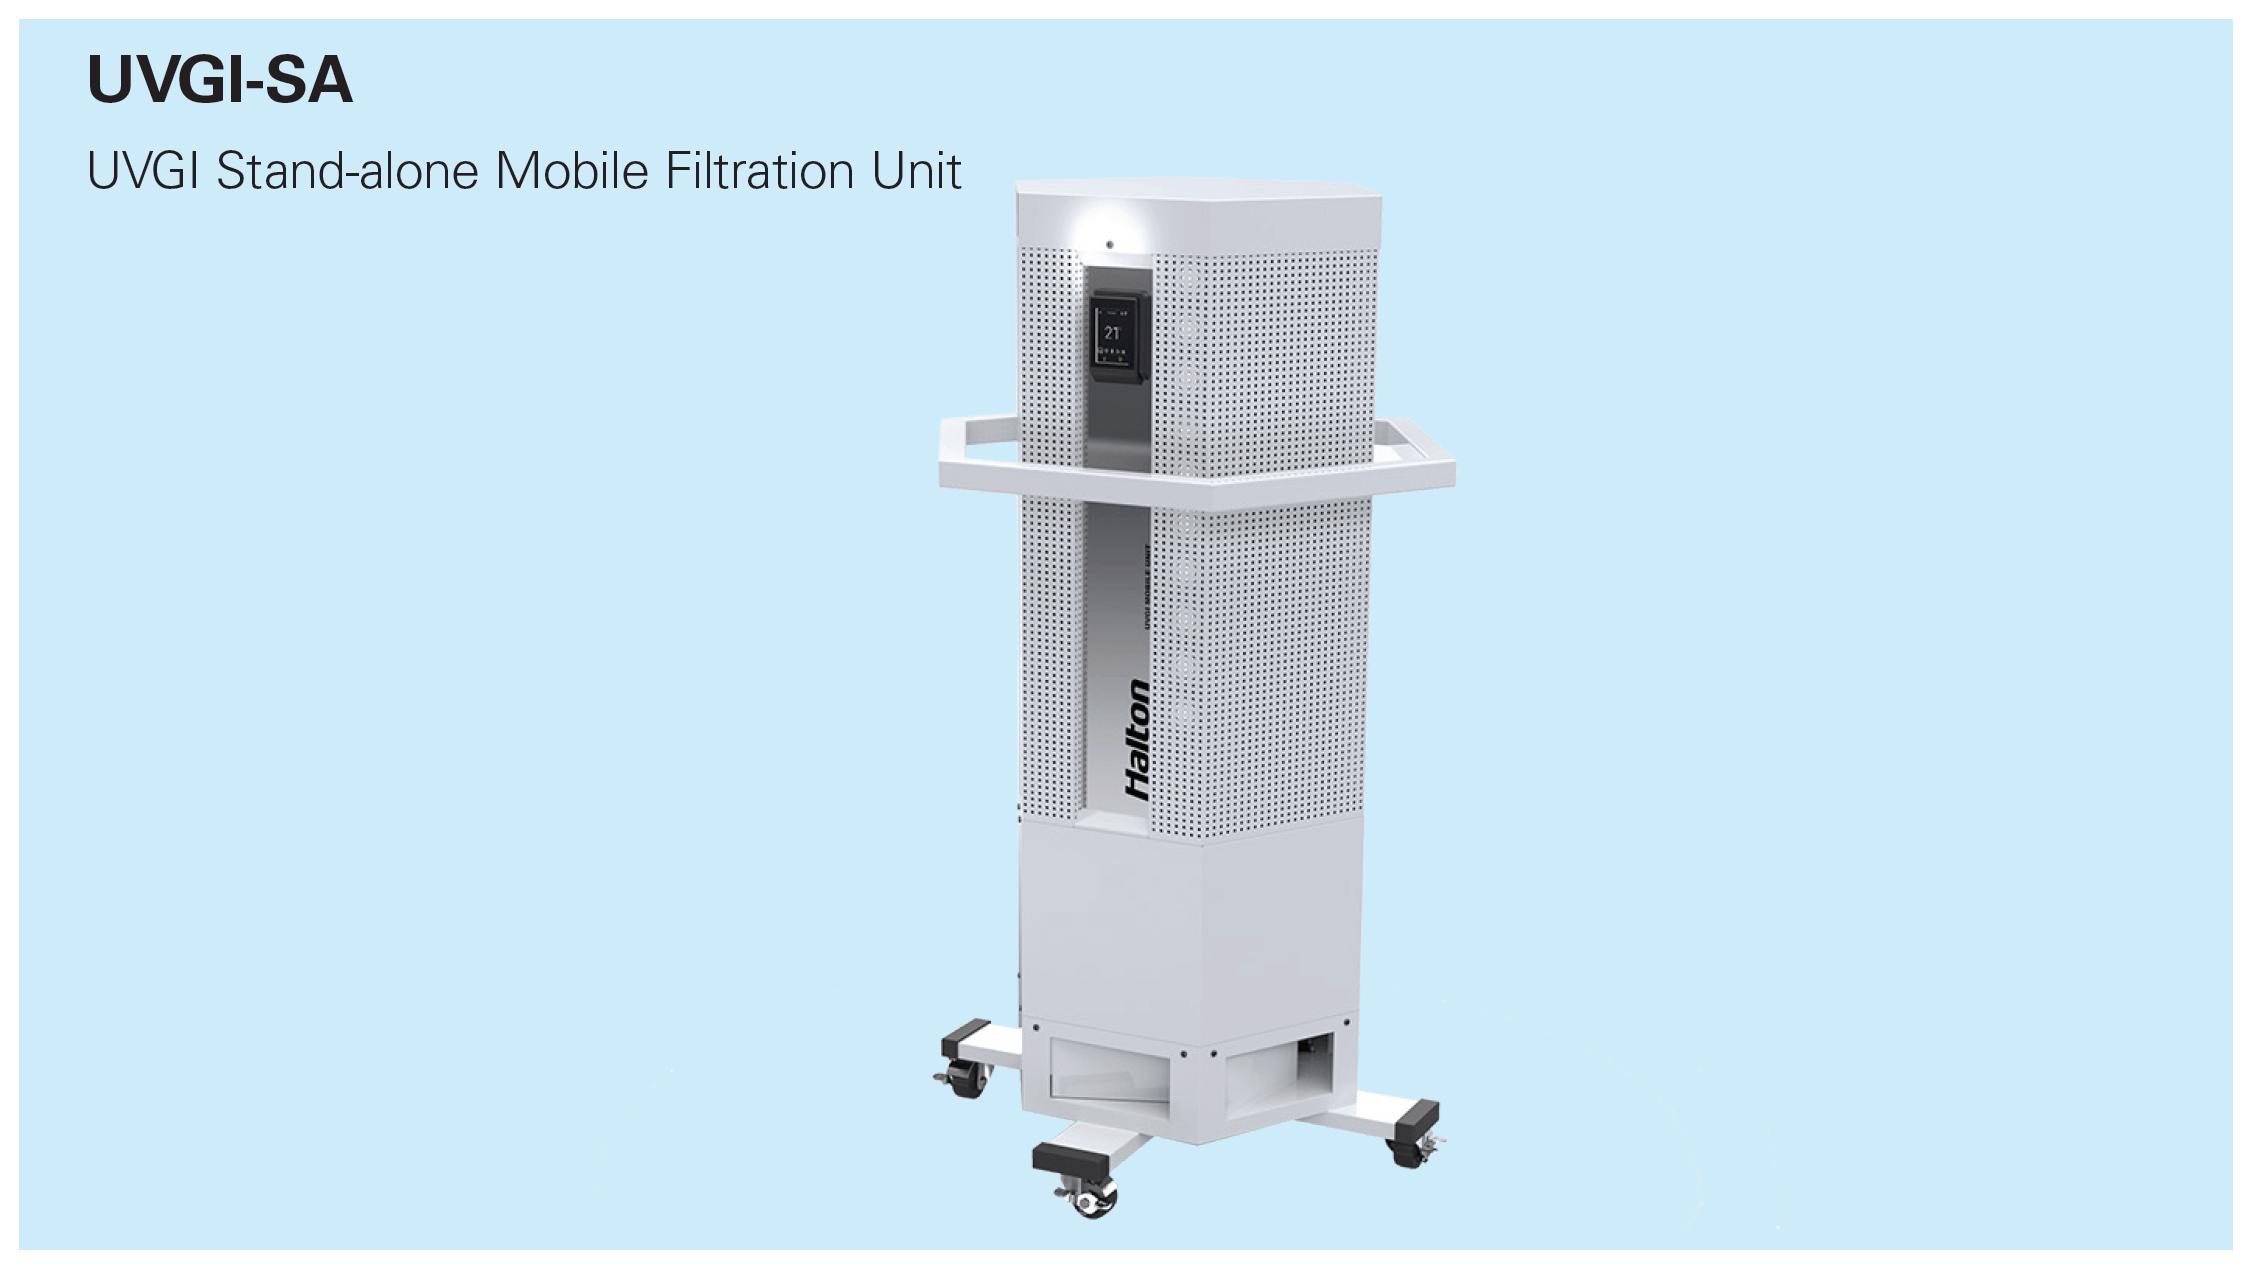 UVGI Stand-alone Mobile Filtration Unit